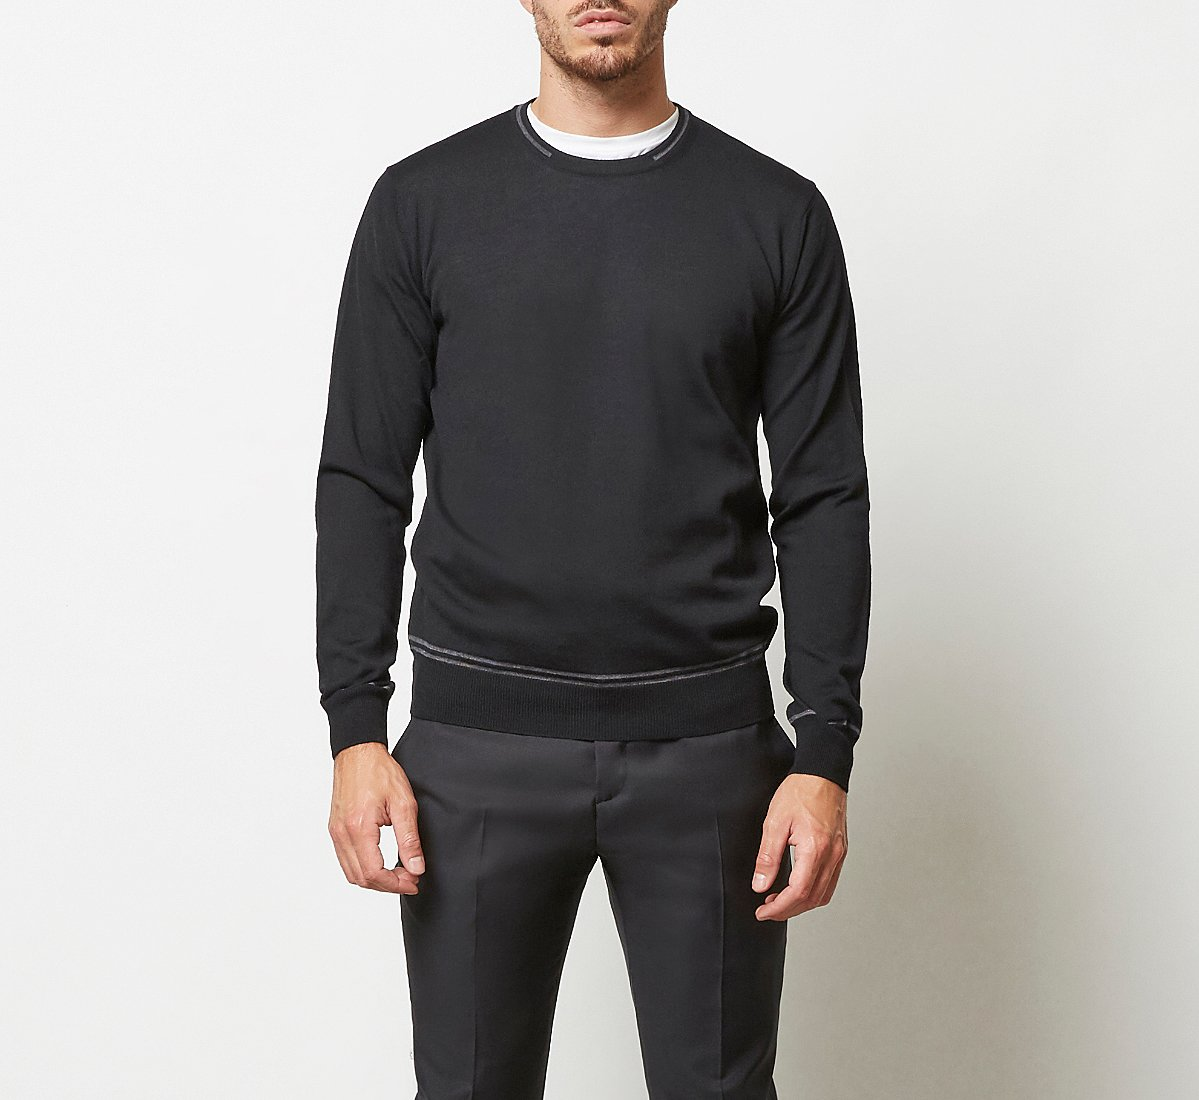 Maglioncino a contrasto in calda lana